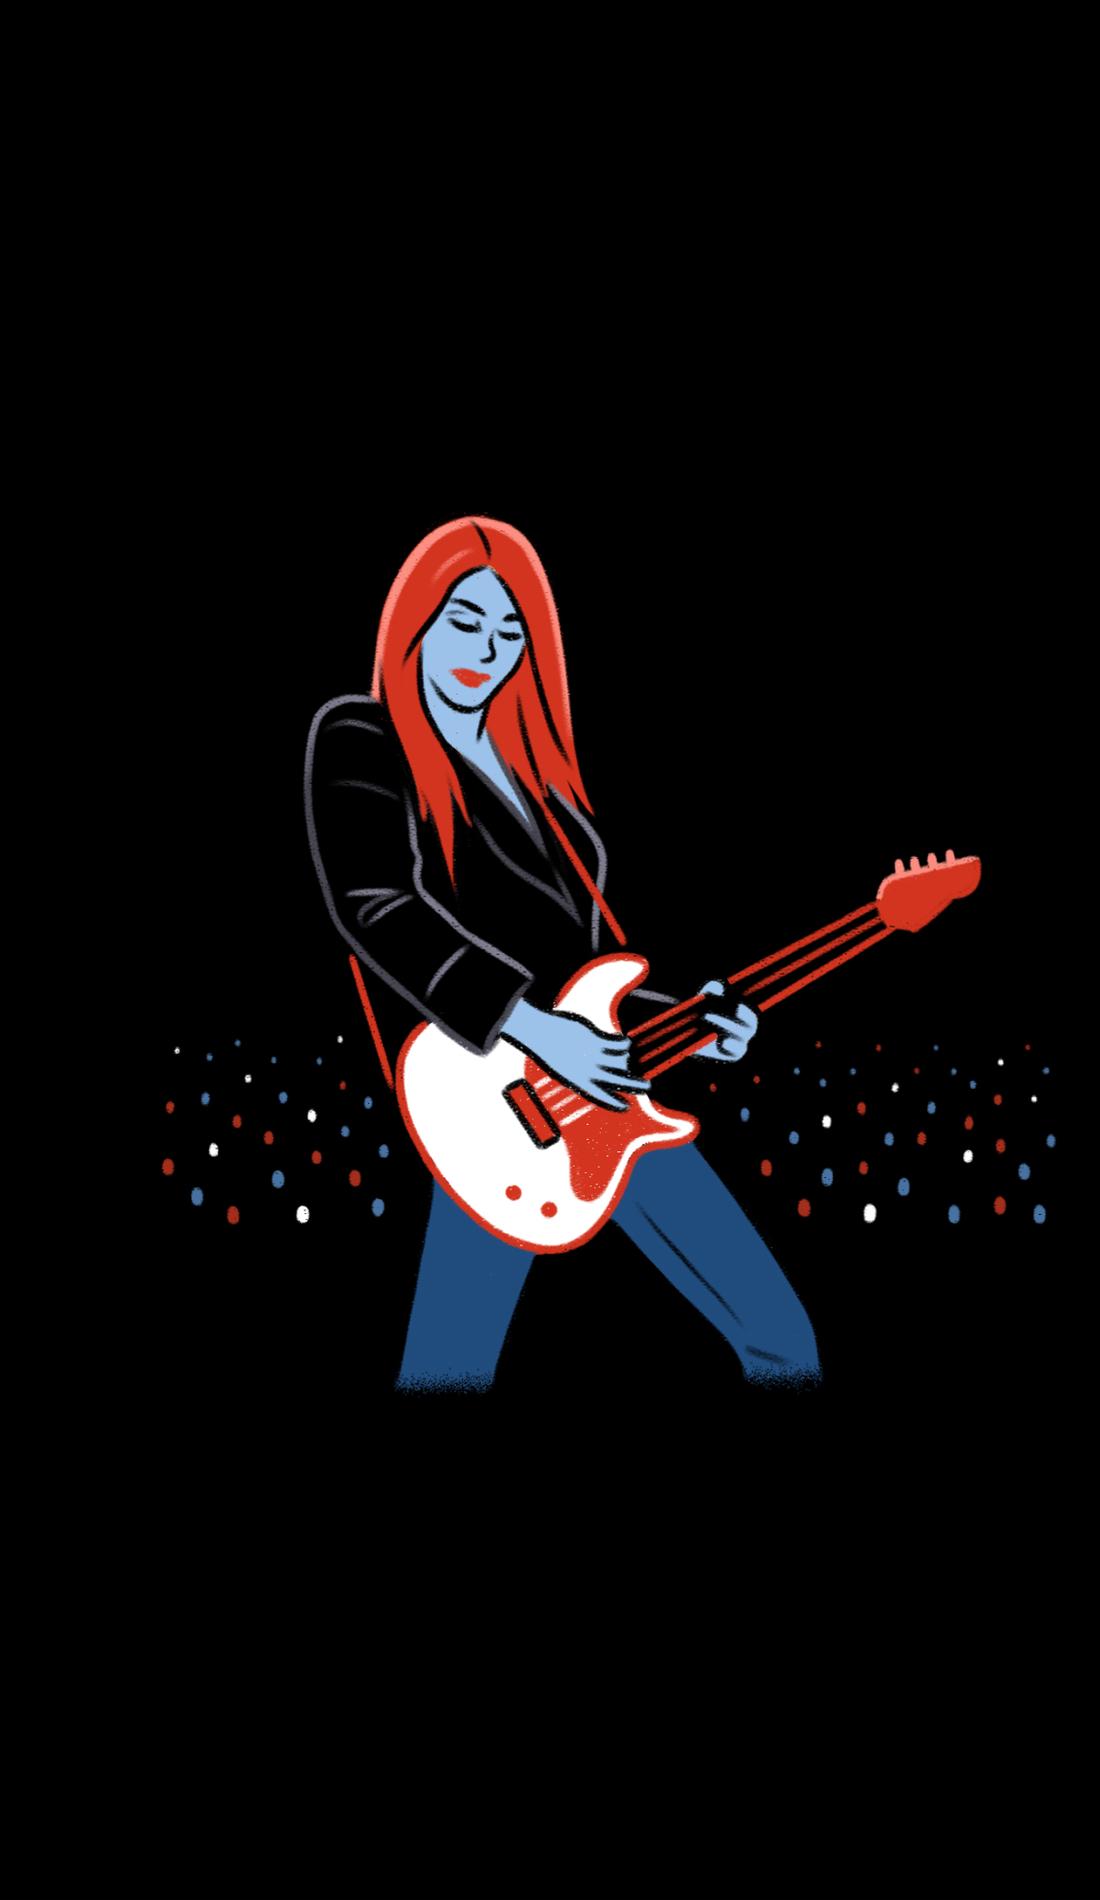 A Jason Marsalis live event